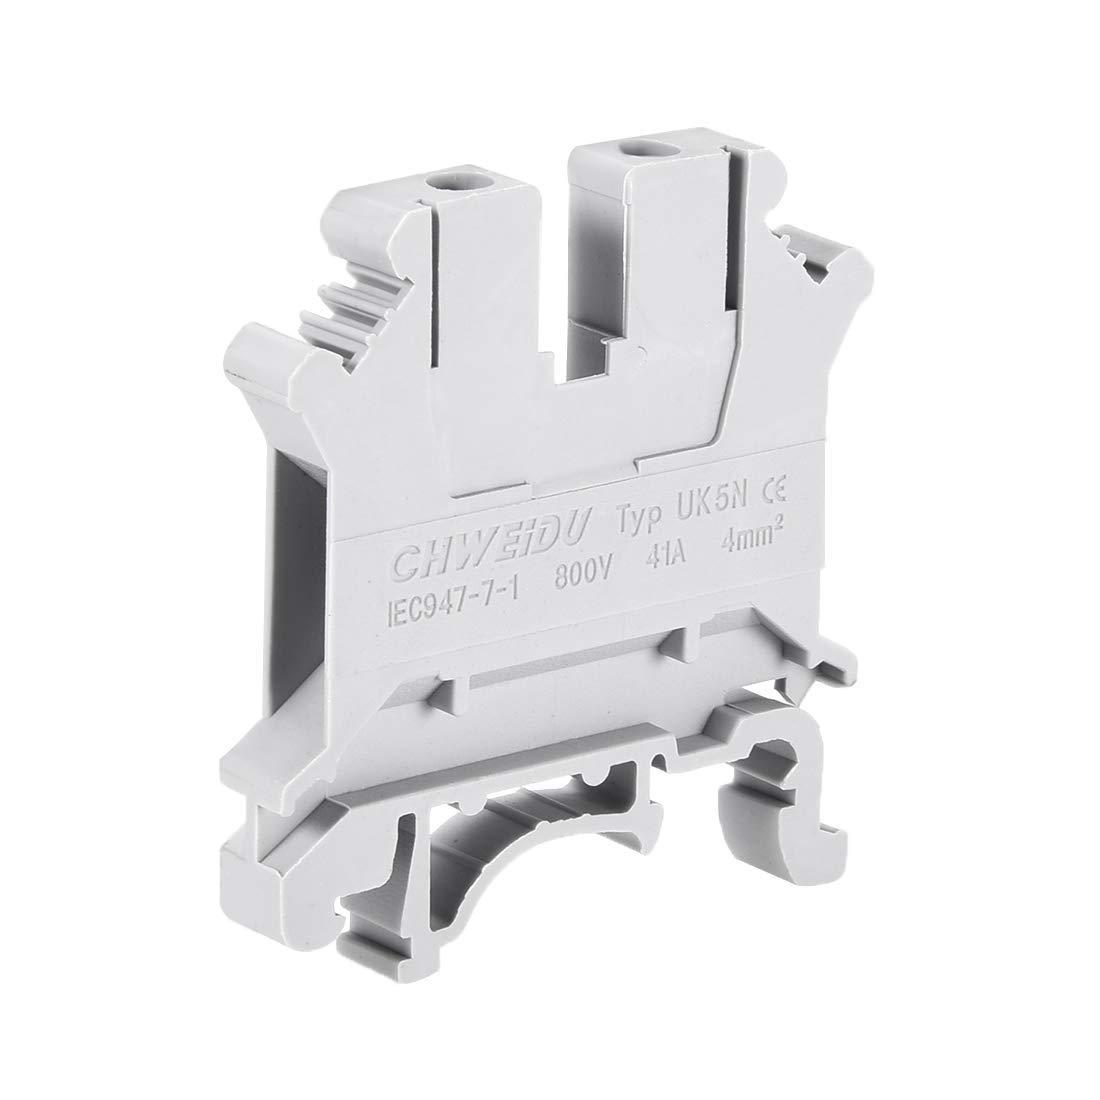 ZCHXD UK5N DIN Rail Terminal Block Screw Clamp Connector ...